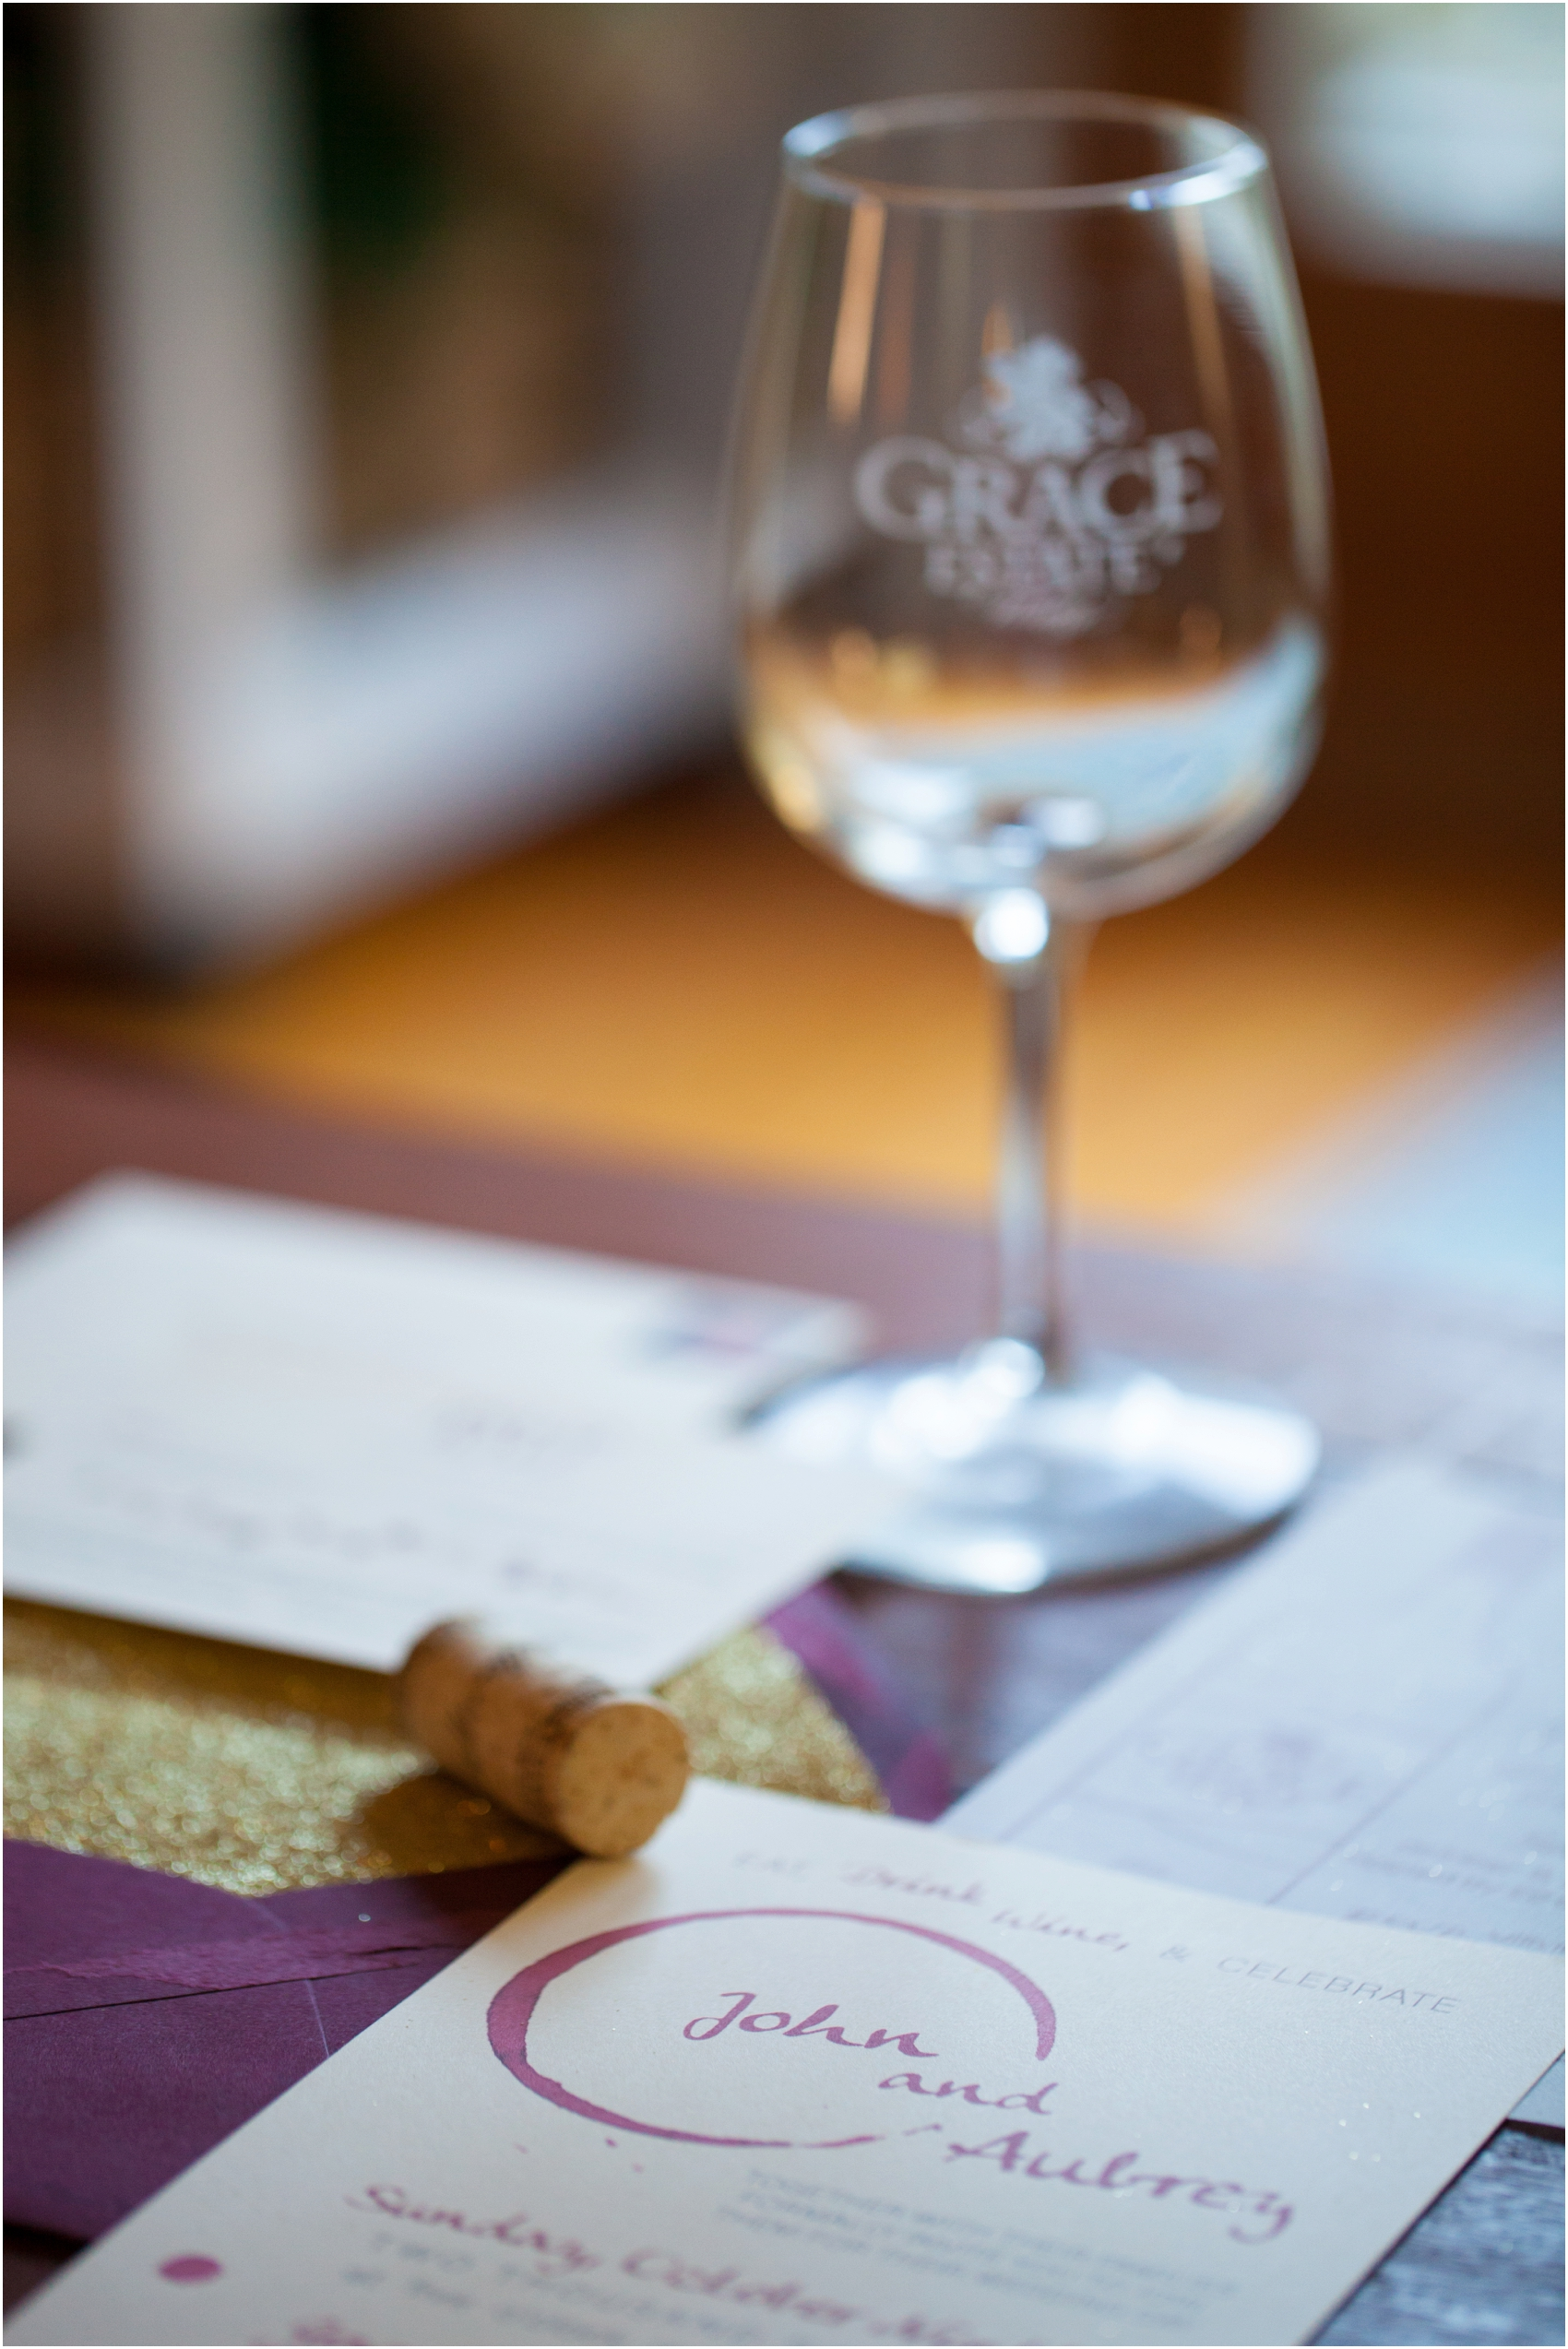 Grace-Estate-Winery-Fall-Virginia-Wedding-5594.jpg